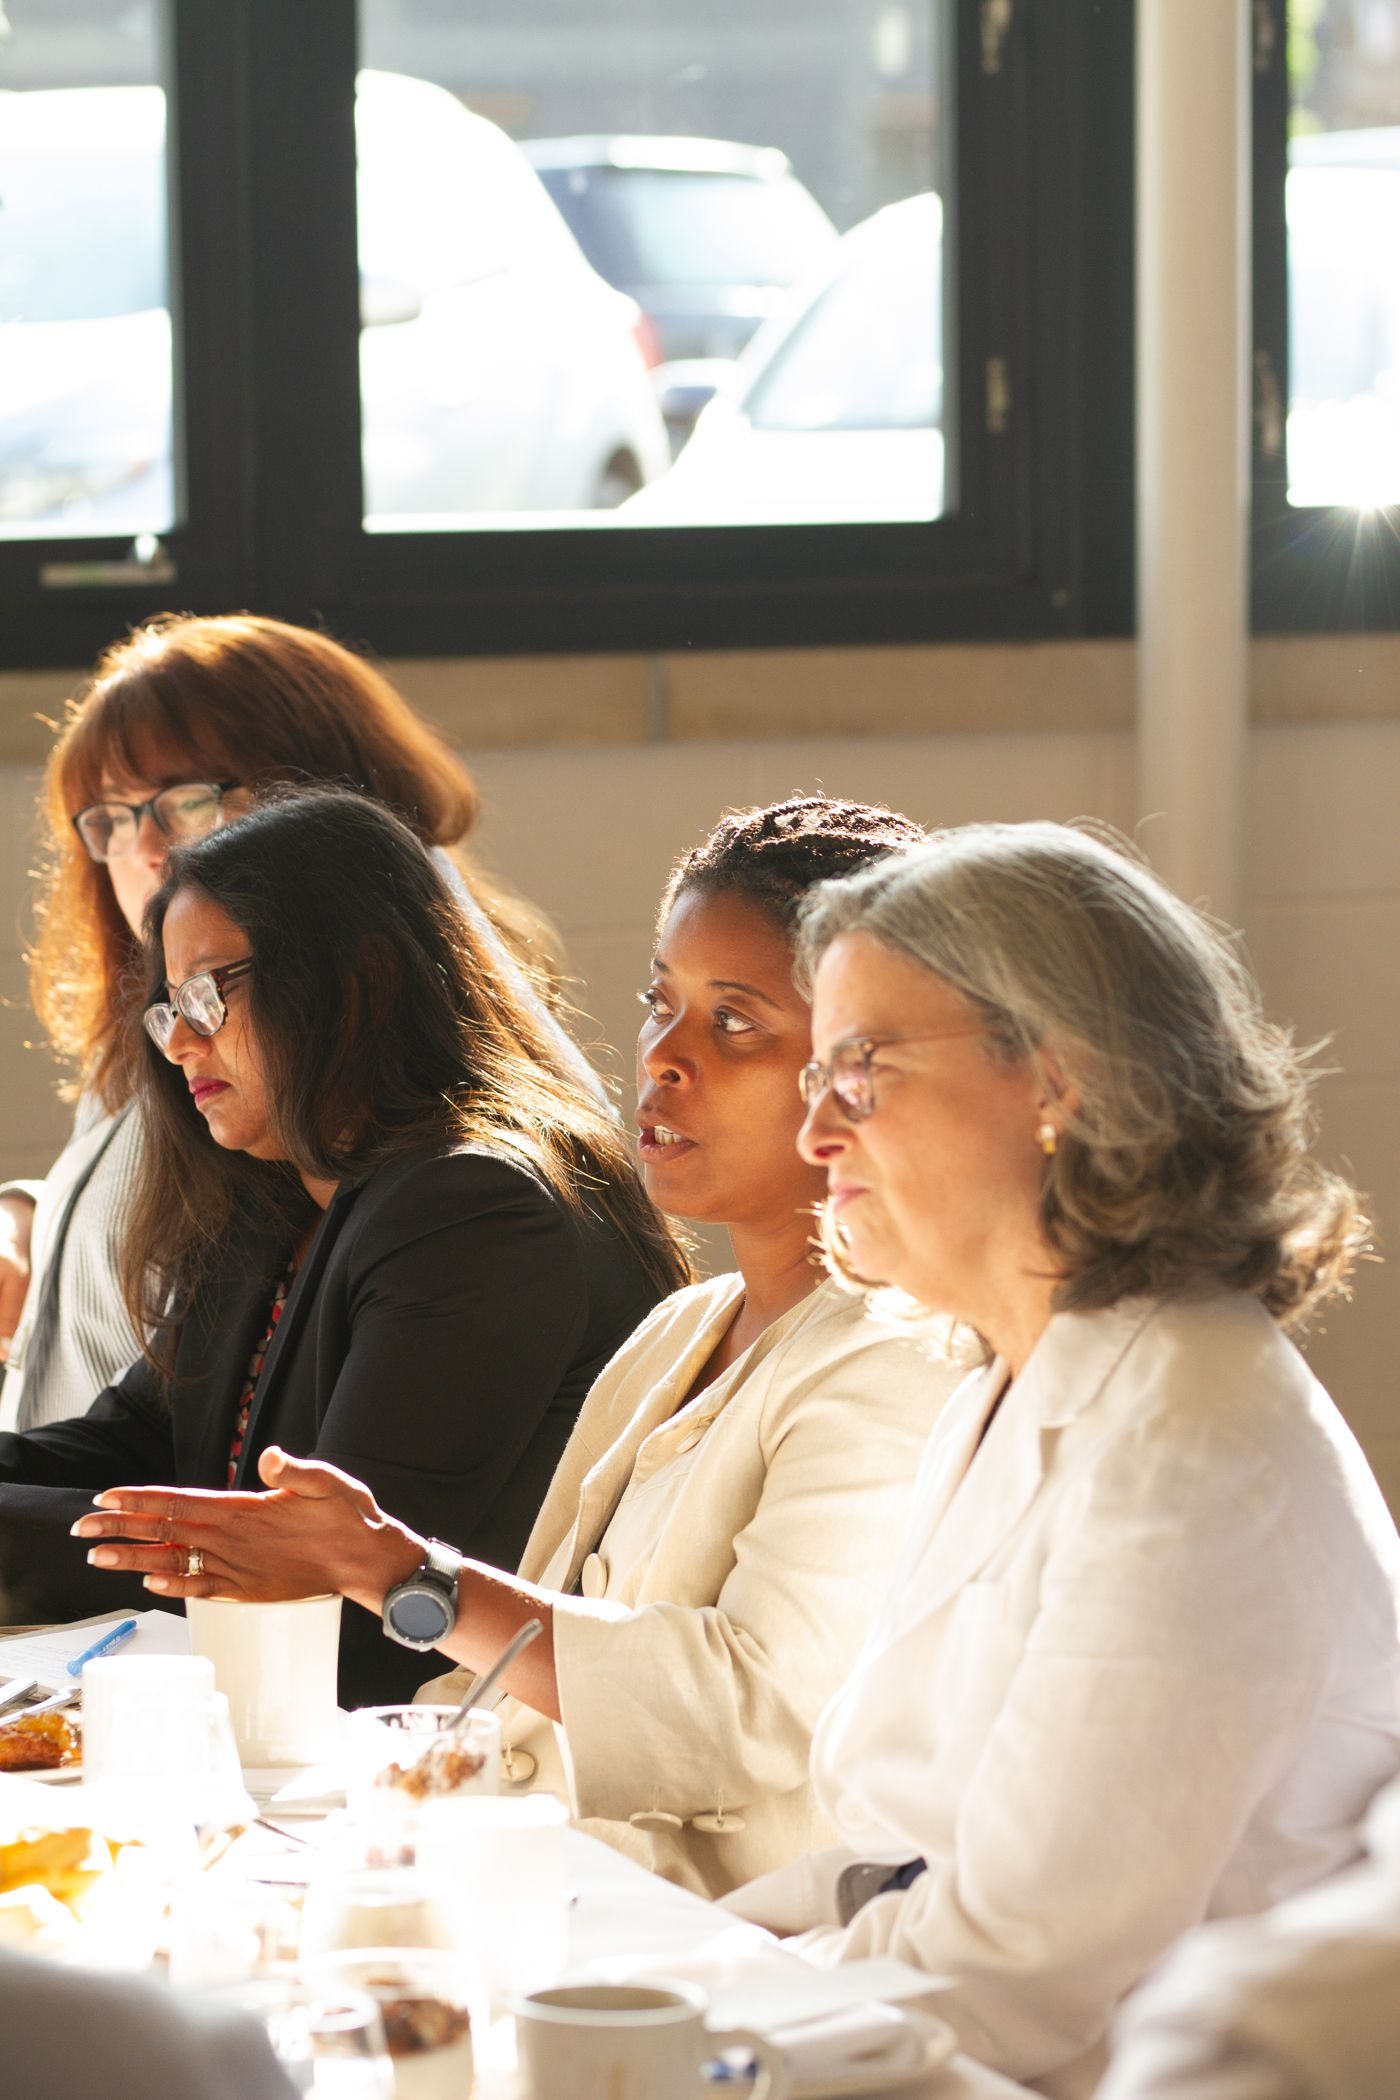 Katina Beard, CEO of Matthew Walker Health Center in conversation at the Axios roundtable.